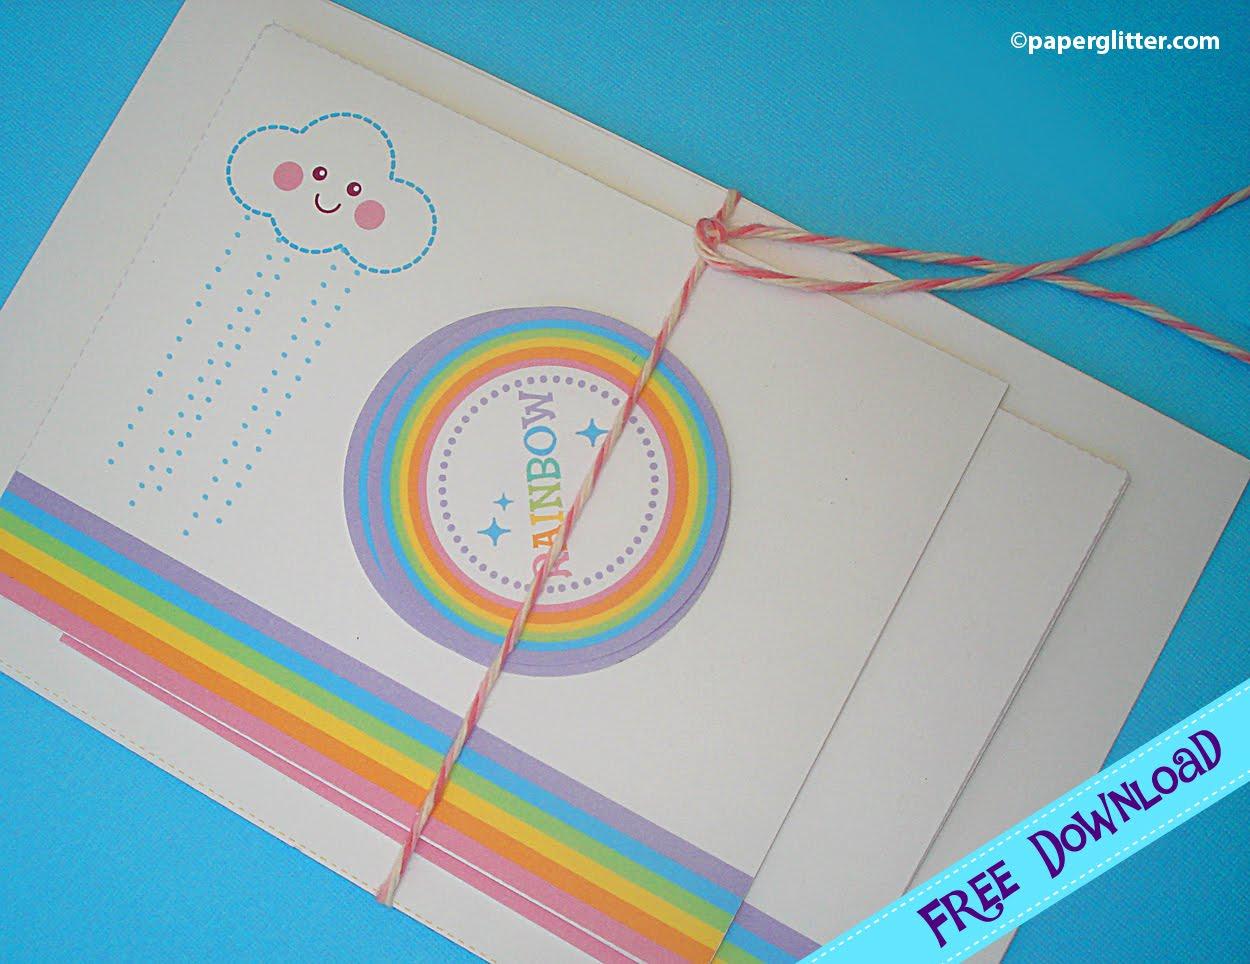 The Lemondrop Tree Free Printable Rainbow Stationary And Accesories